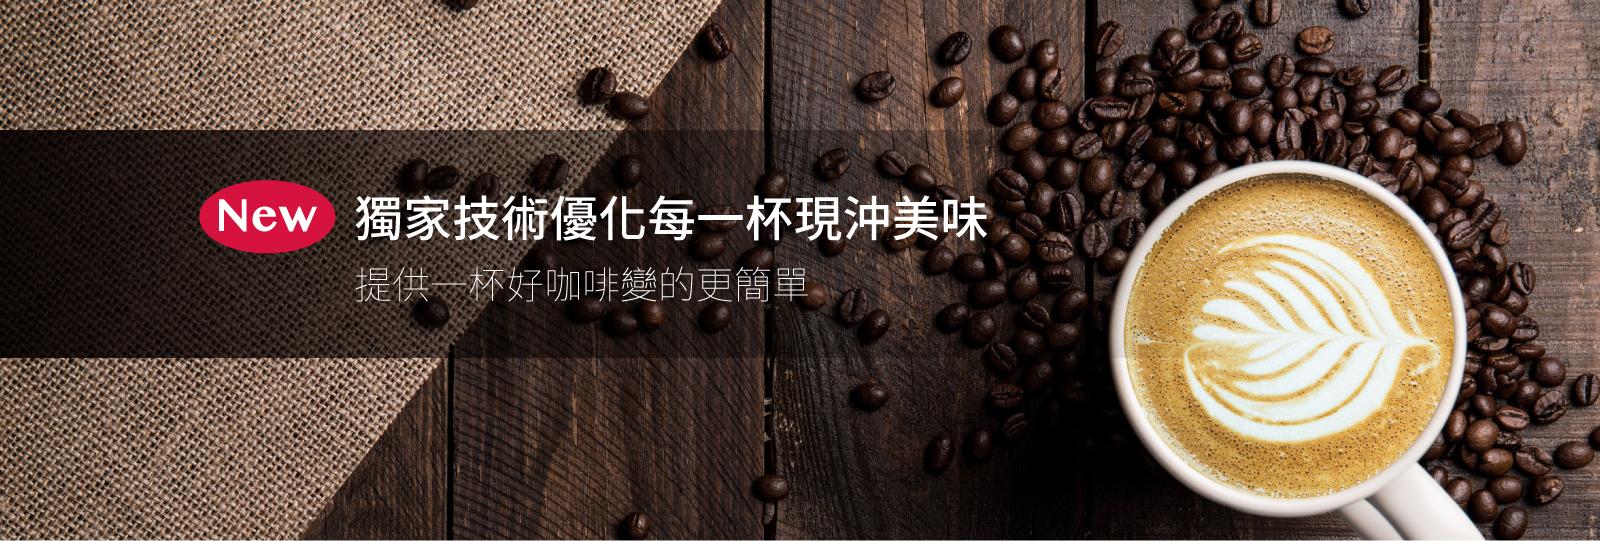 CoCoCafe無人咖啡機加盟-獨家技術優化每一杯現沖美味